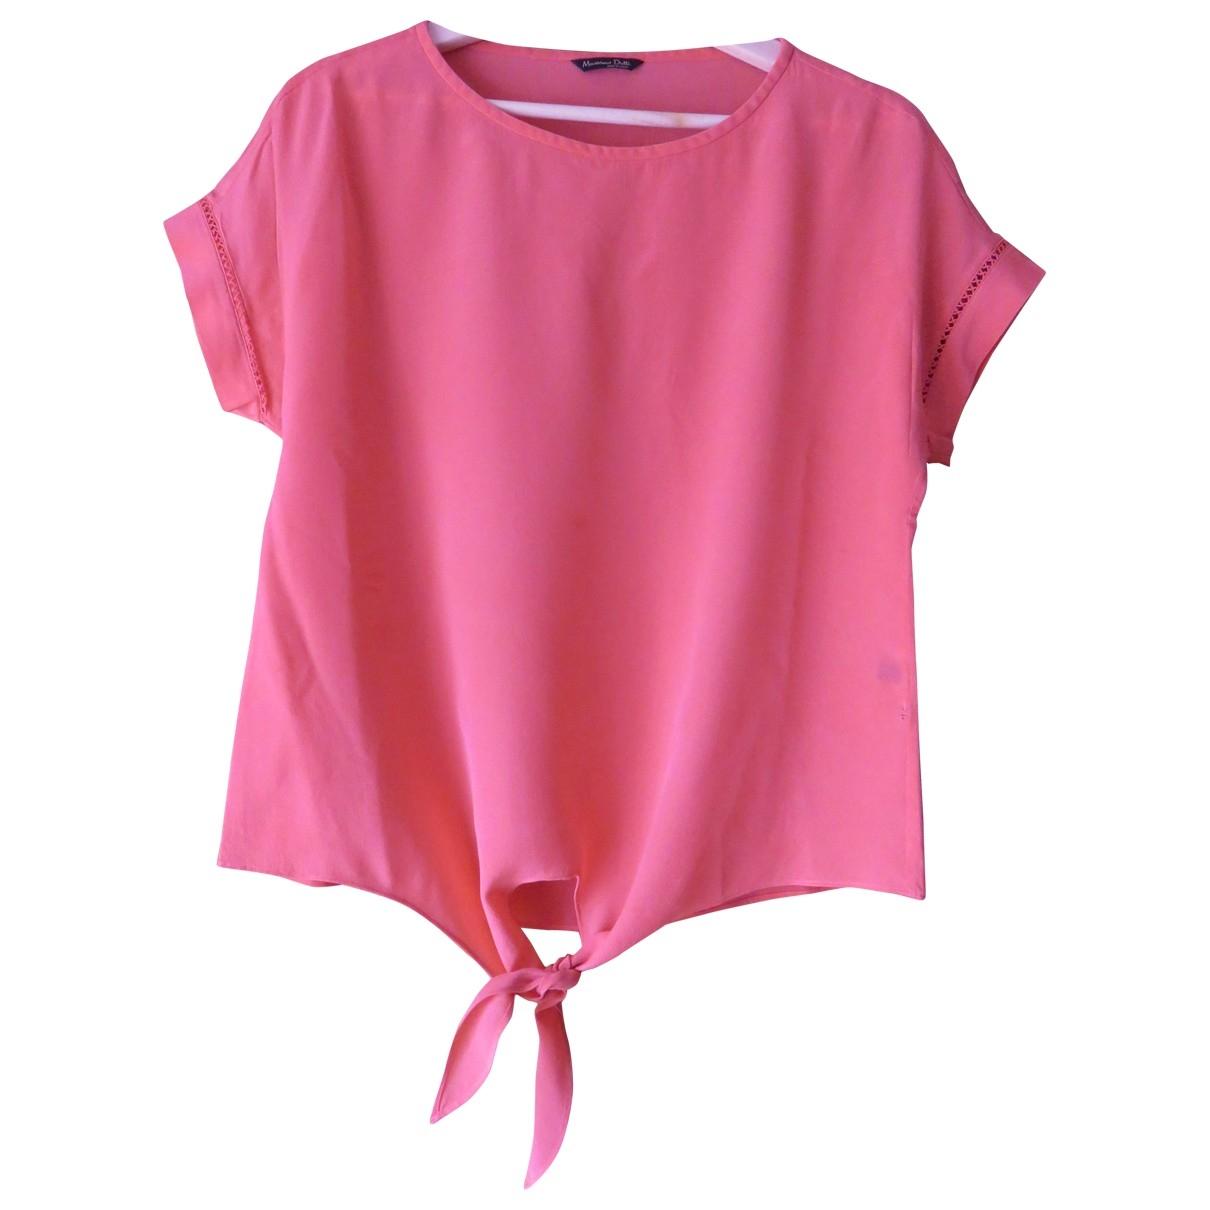 Massimo Dutti - Top   pour femme - rose